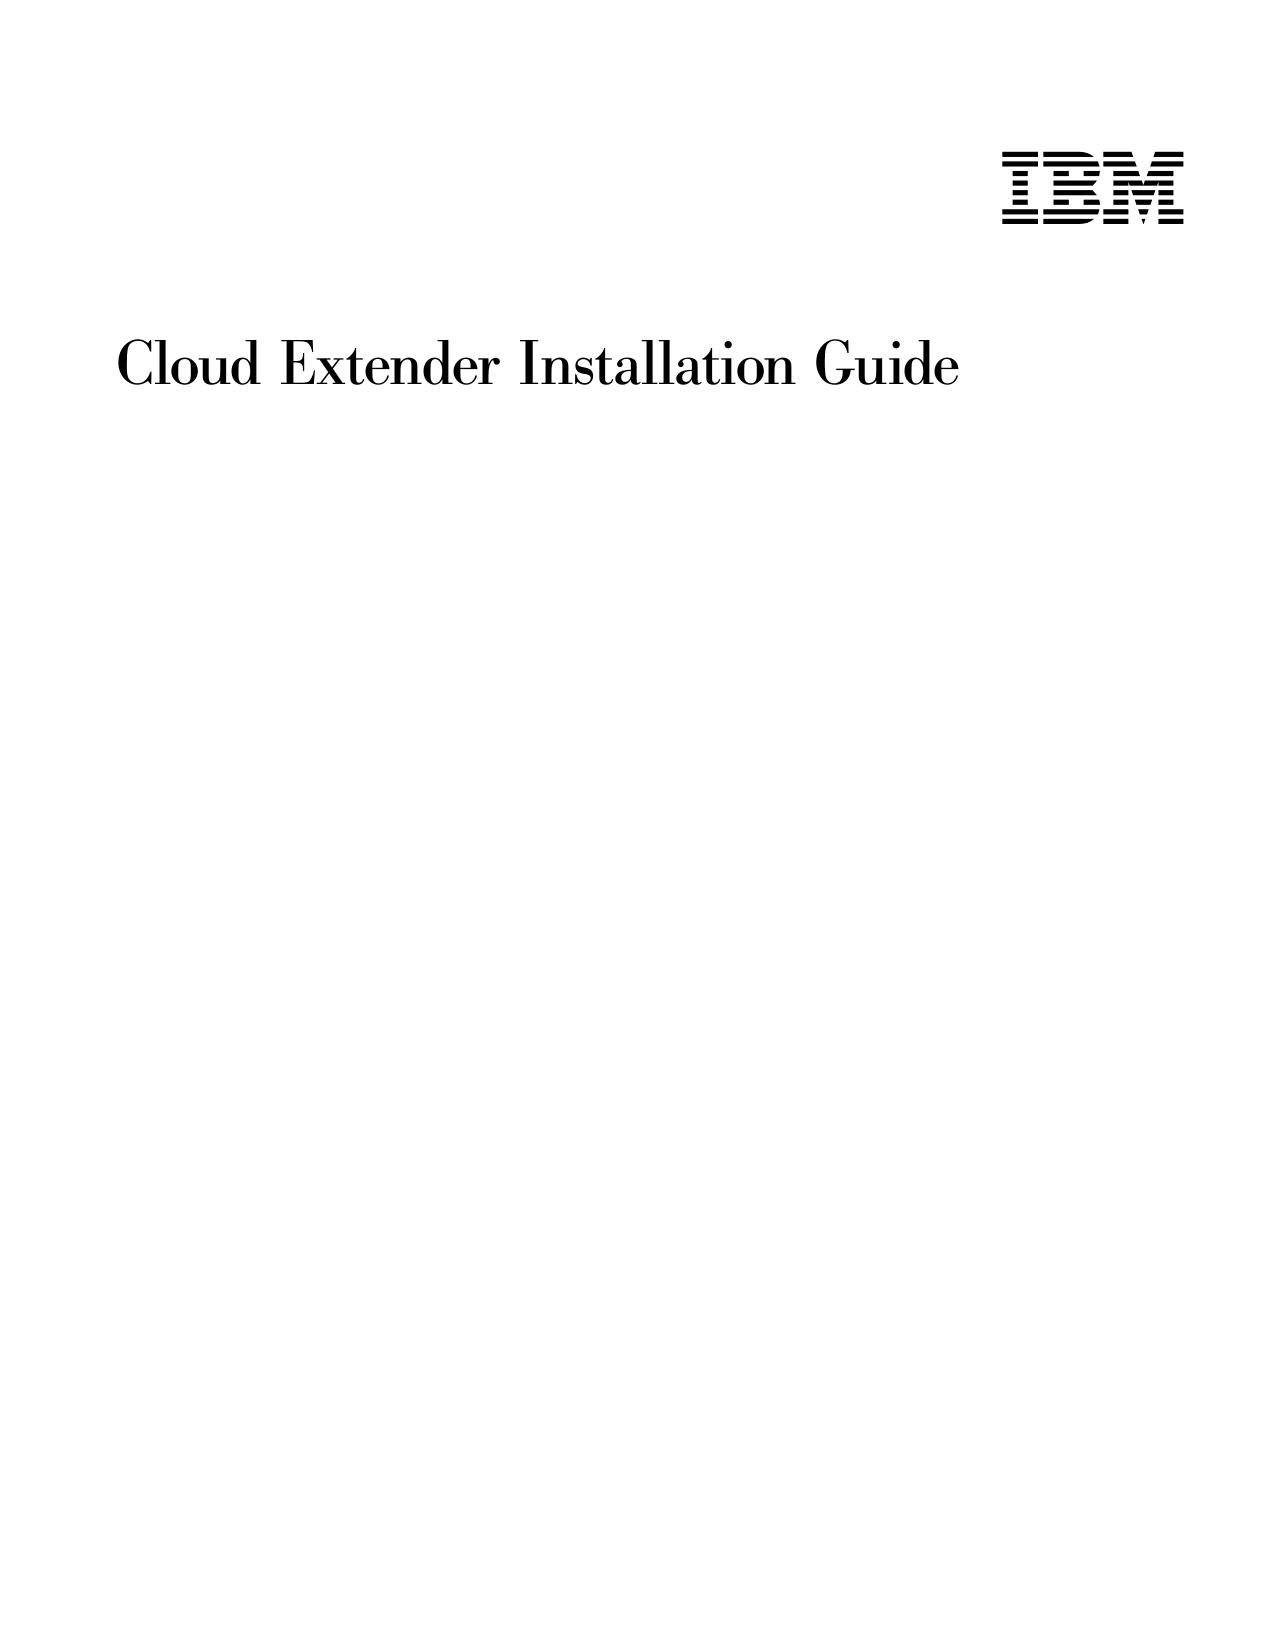 Cloud Extender Installation Guide | manualzz com